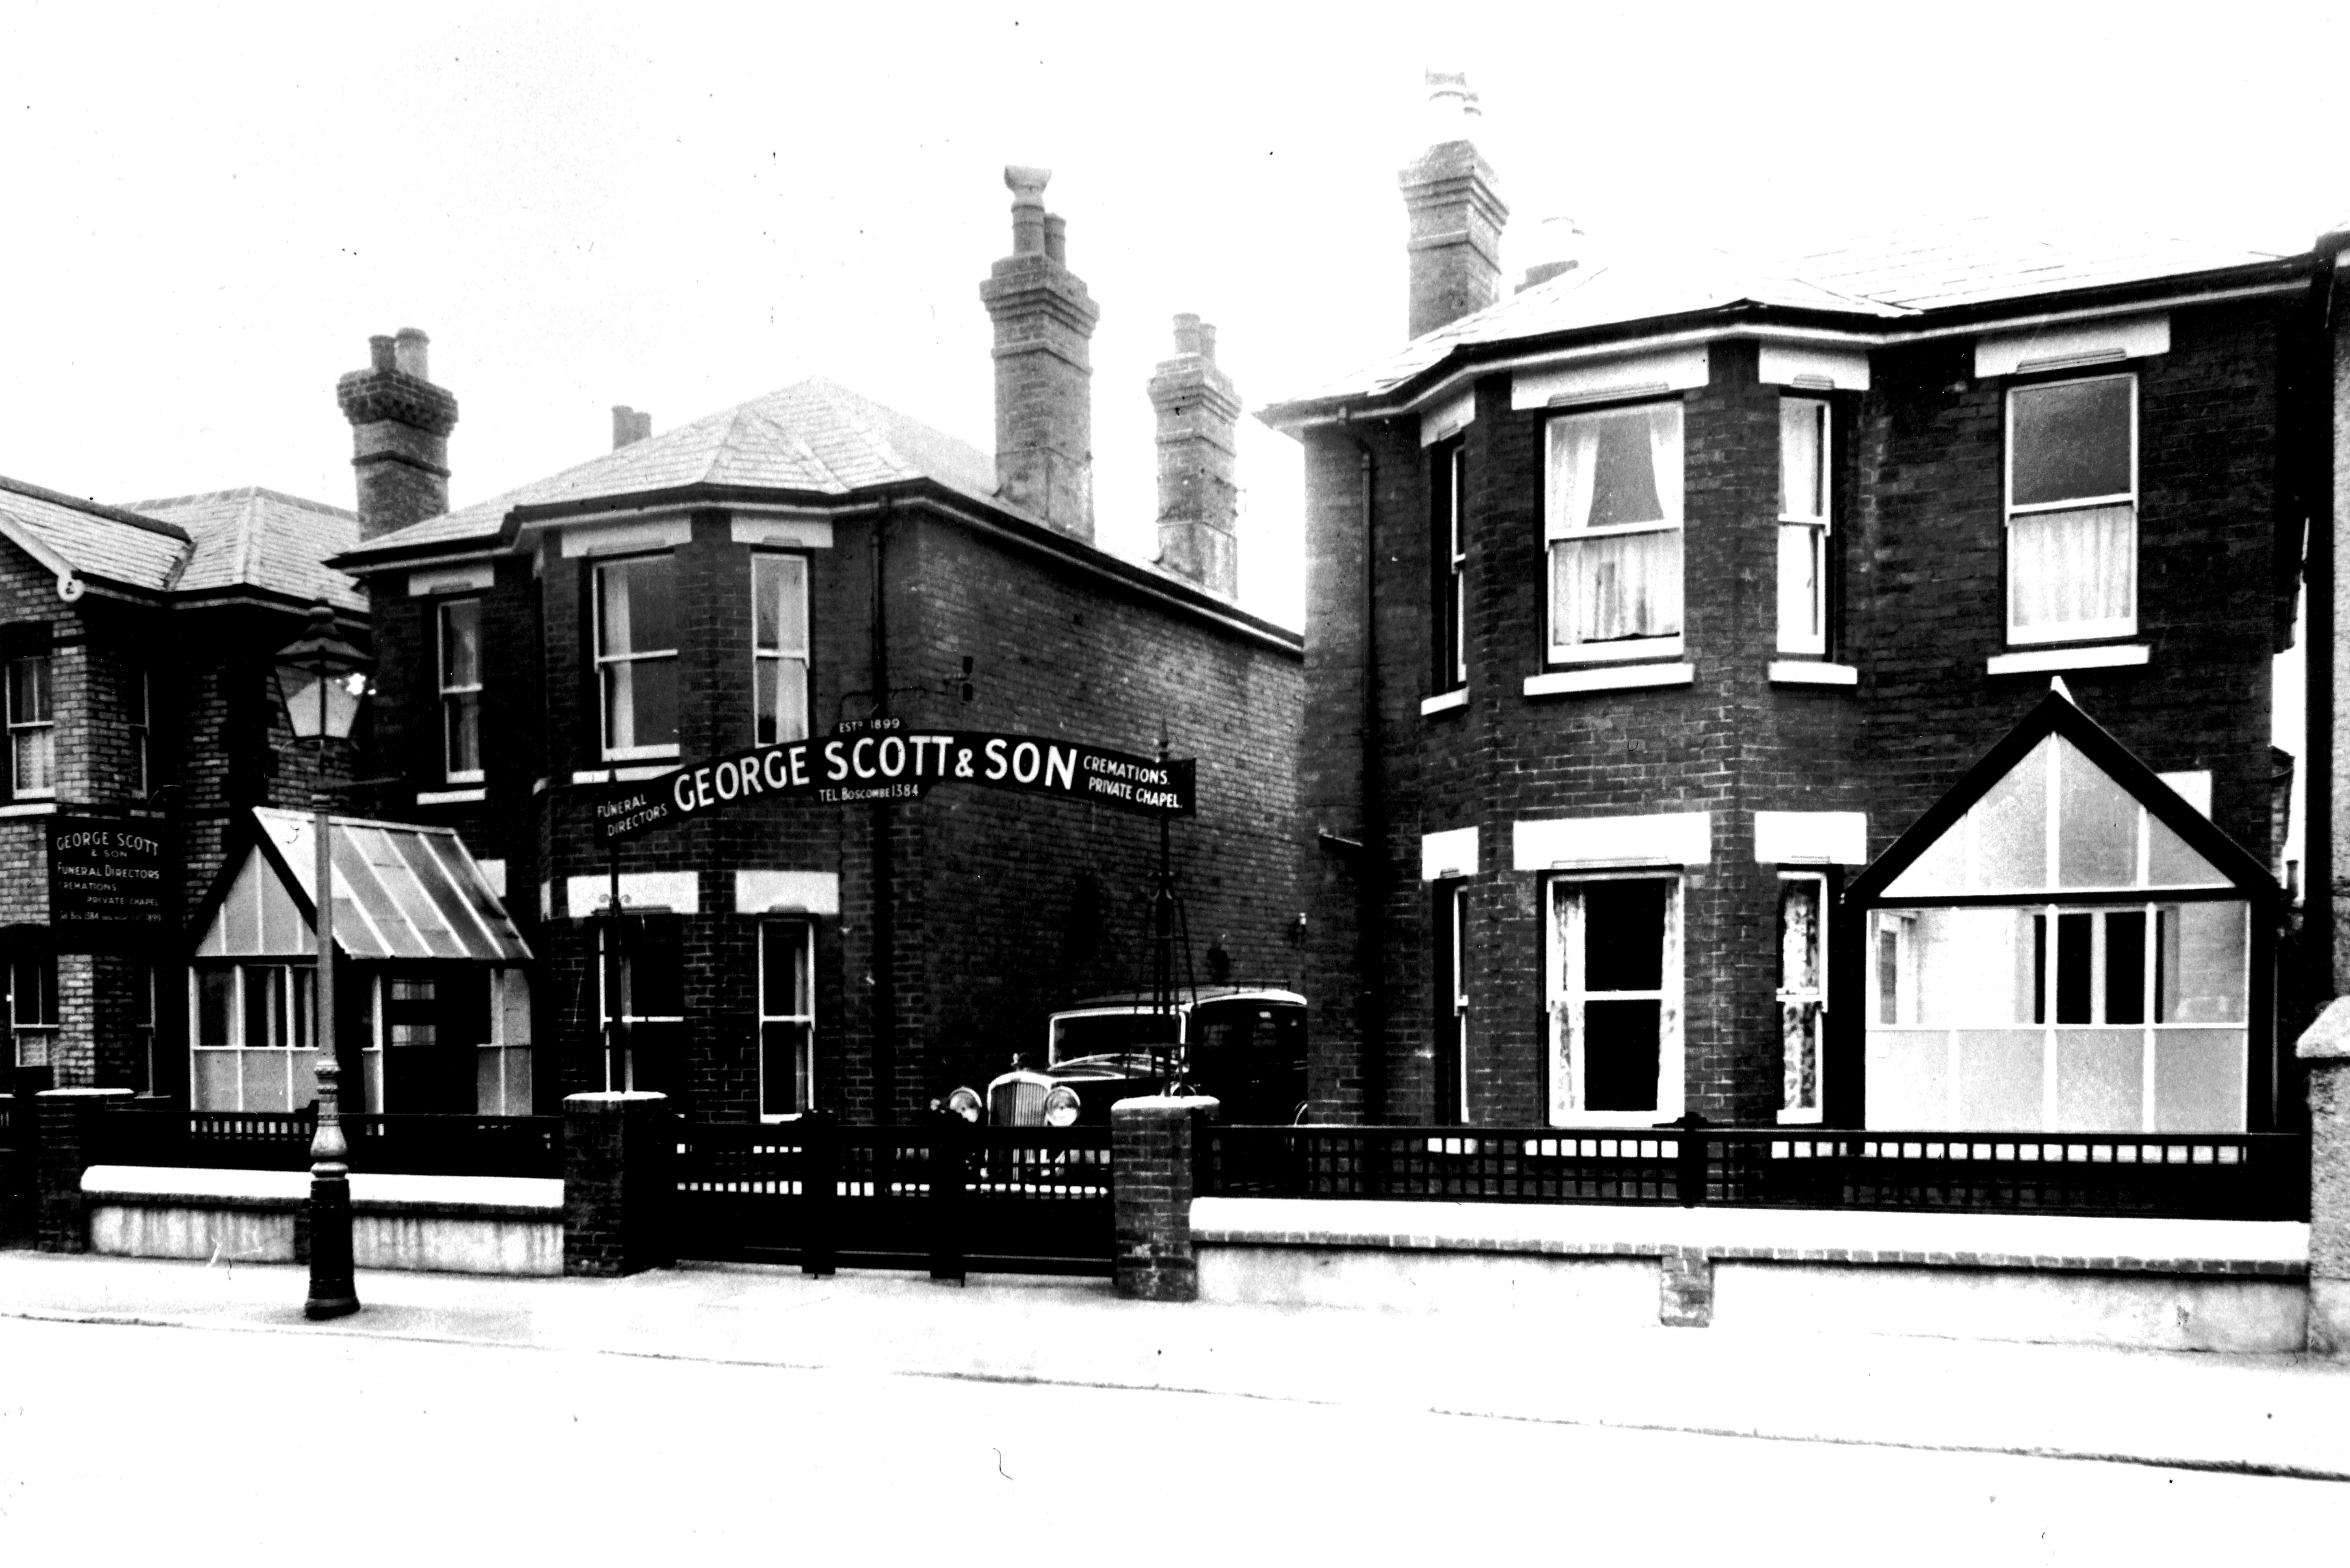 George Scott Funeral Directors funeral home